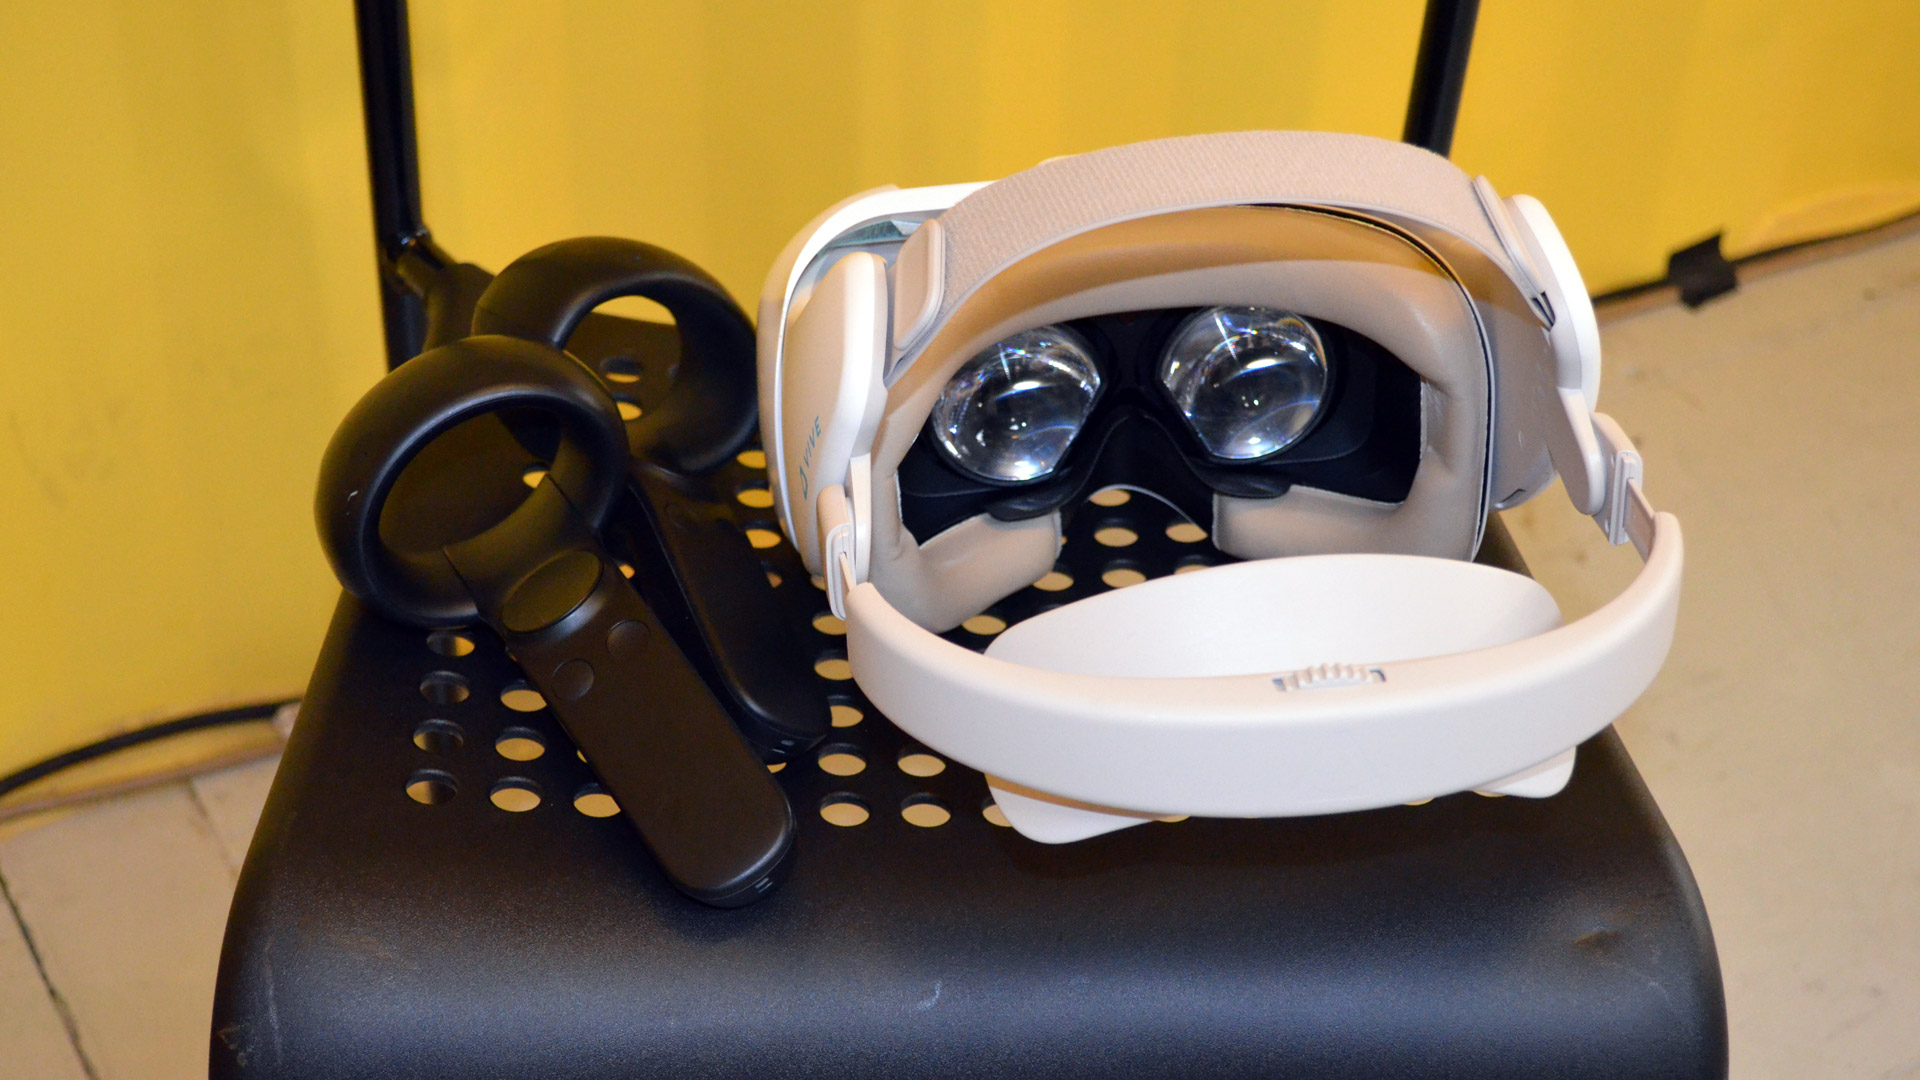 Hands-on: Vive Focus 6DOF Controller Dev Kit – Road to VR